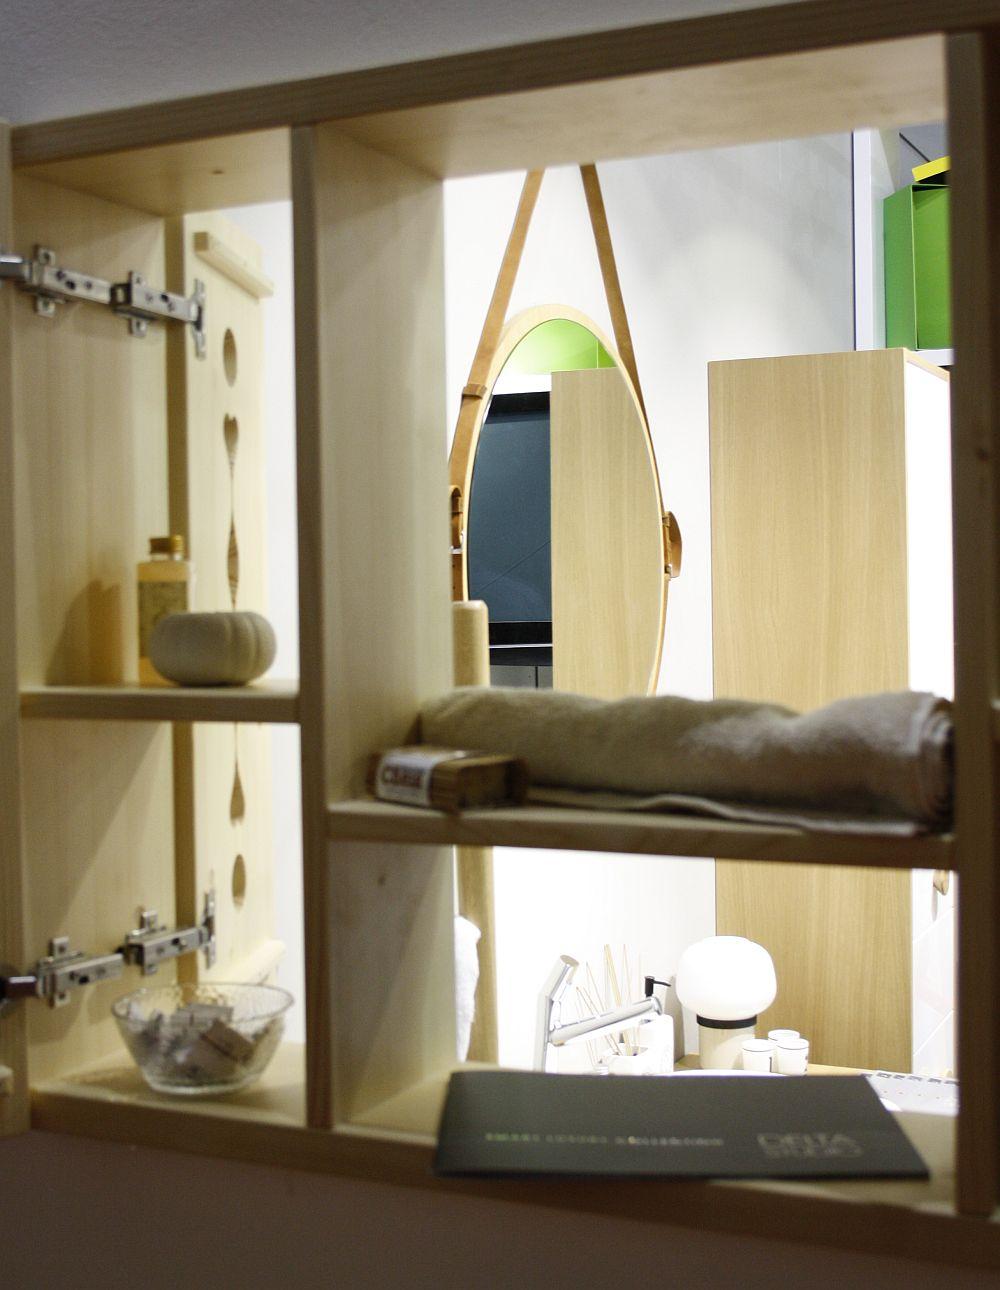 adelaparvu.com despre mobila de baie Smart Luxury la Milano, mobila baie lemn masiv si Corian Delta Studio (5)